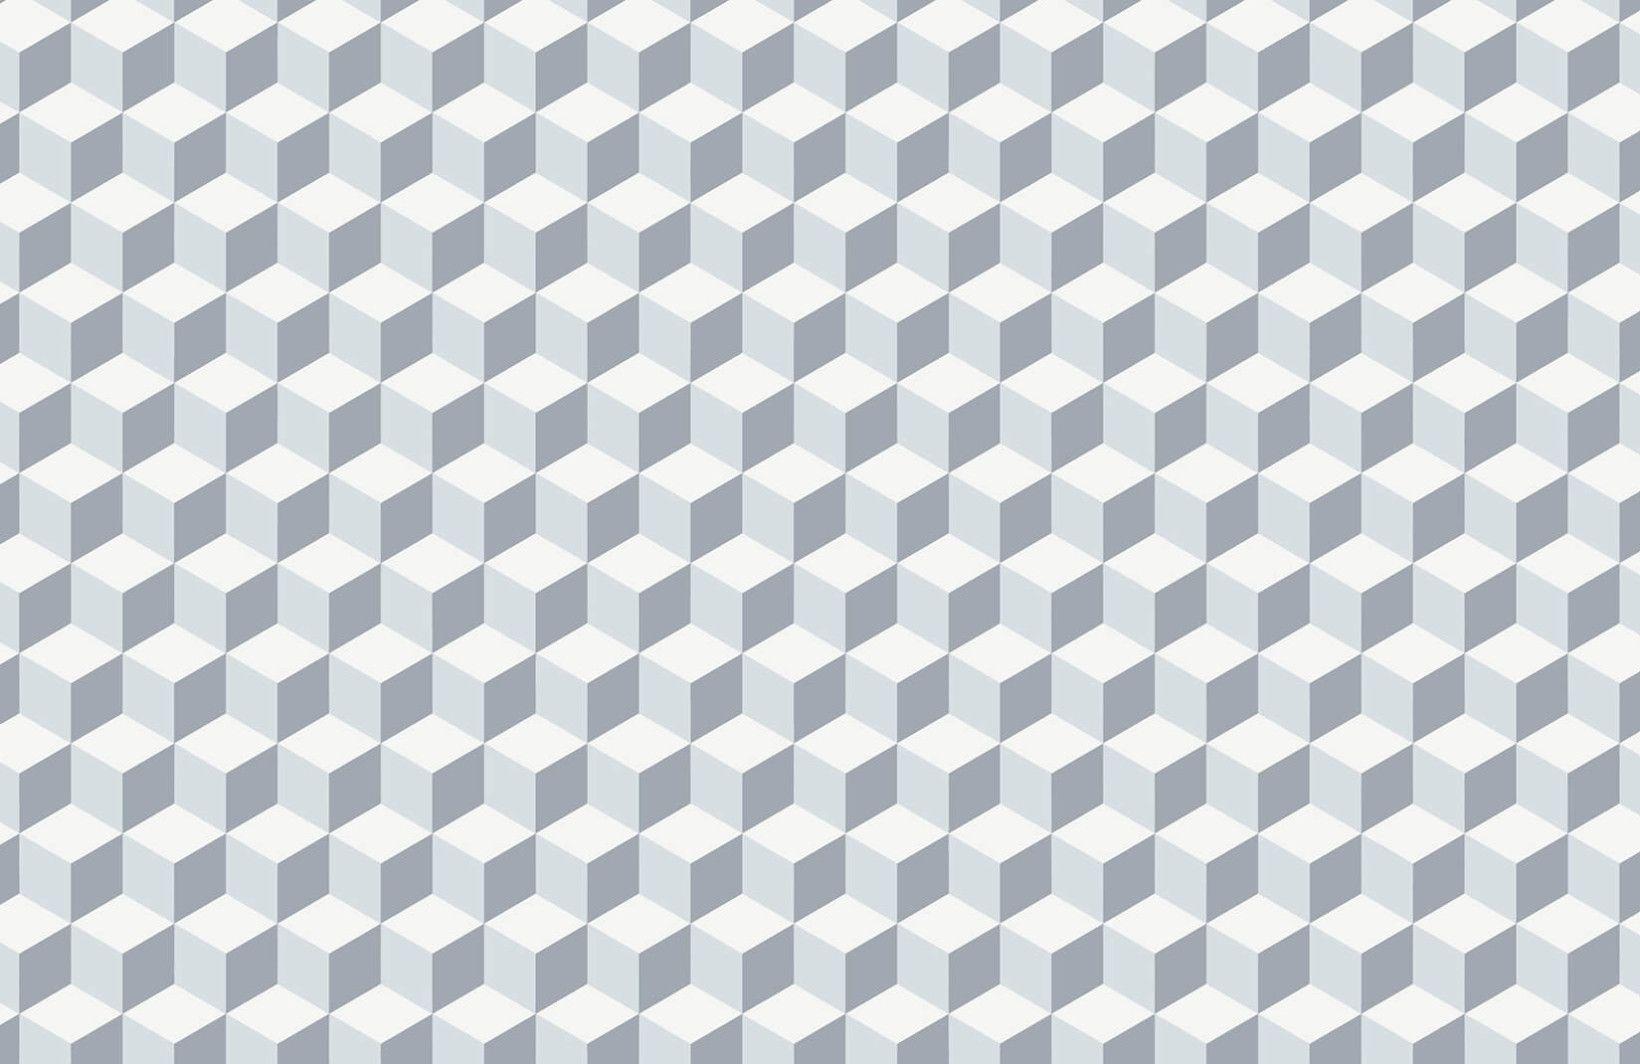 Geometric 3d Cube Wallpaper Mural Cube Pattern Muralswallpaper 3d Cube Wallpaper Cube Pattern Geometric 3d